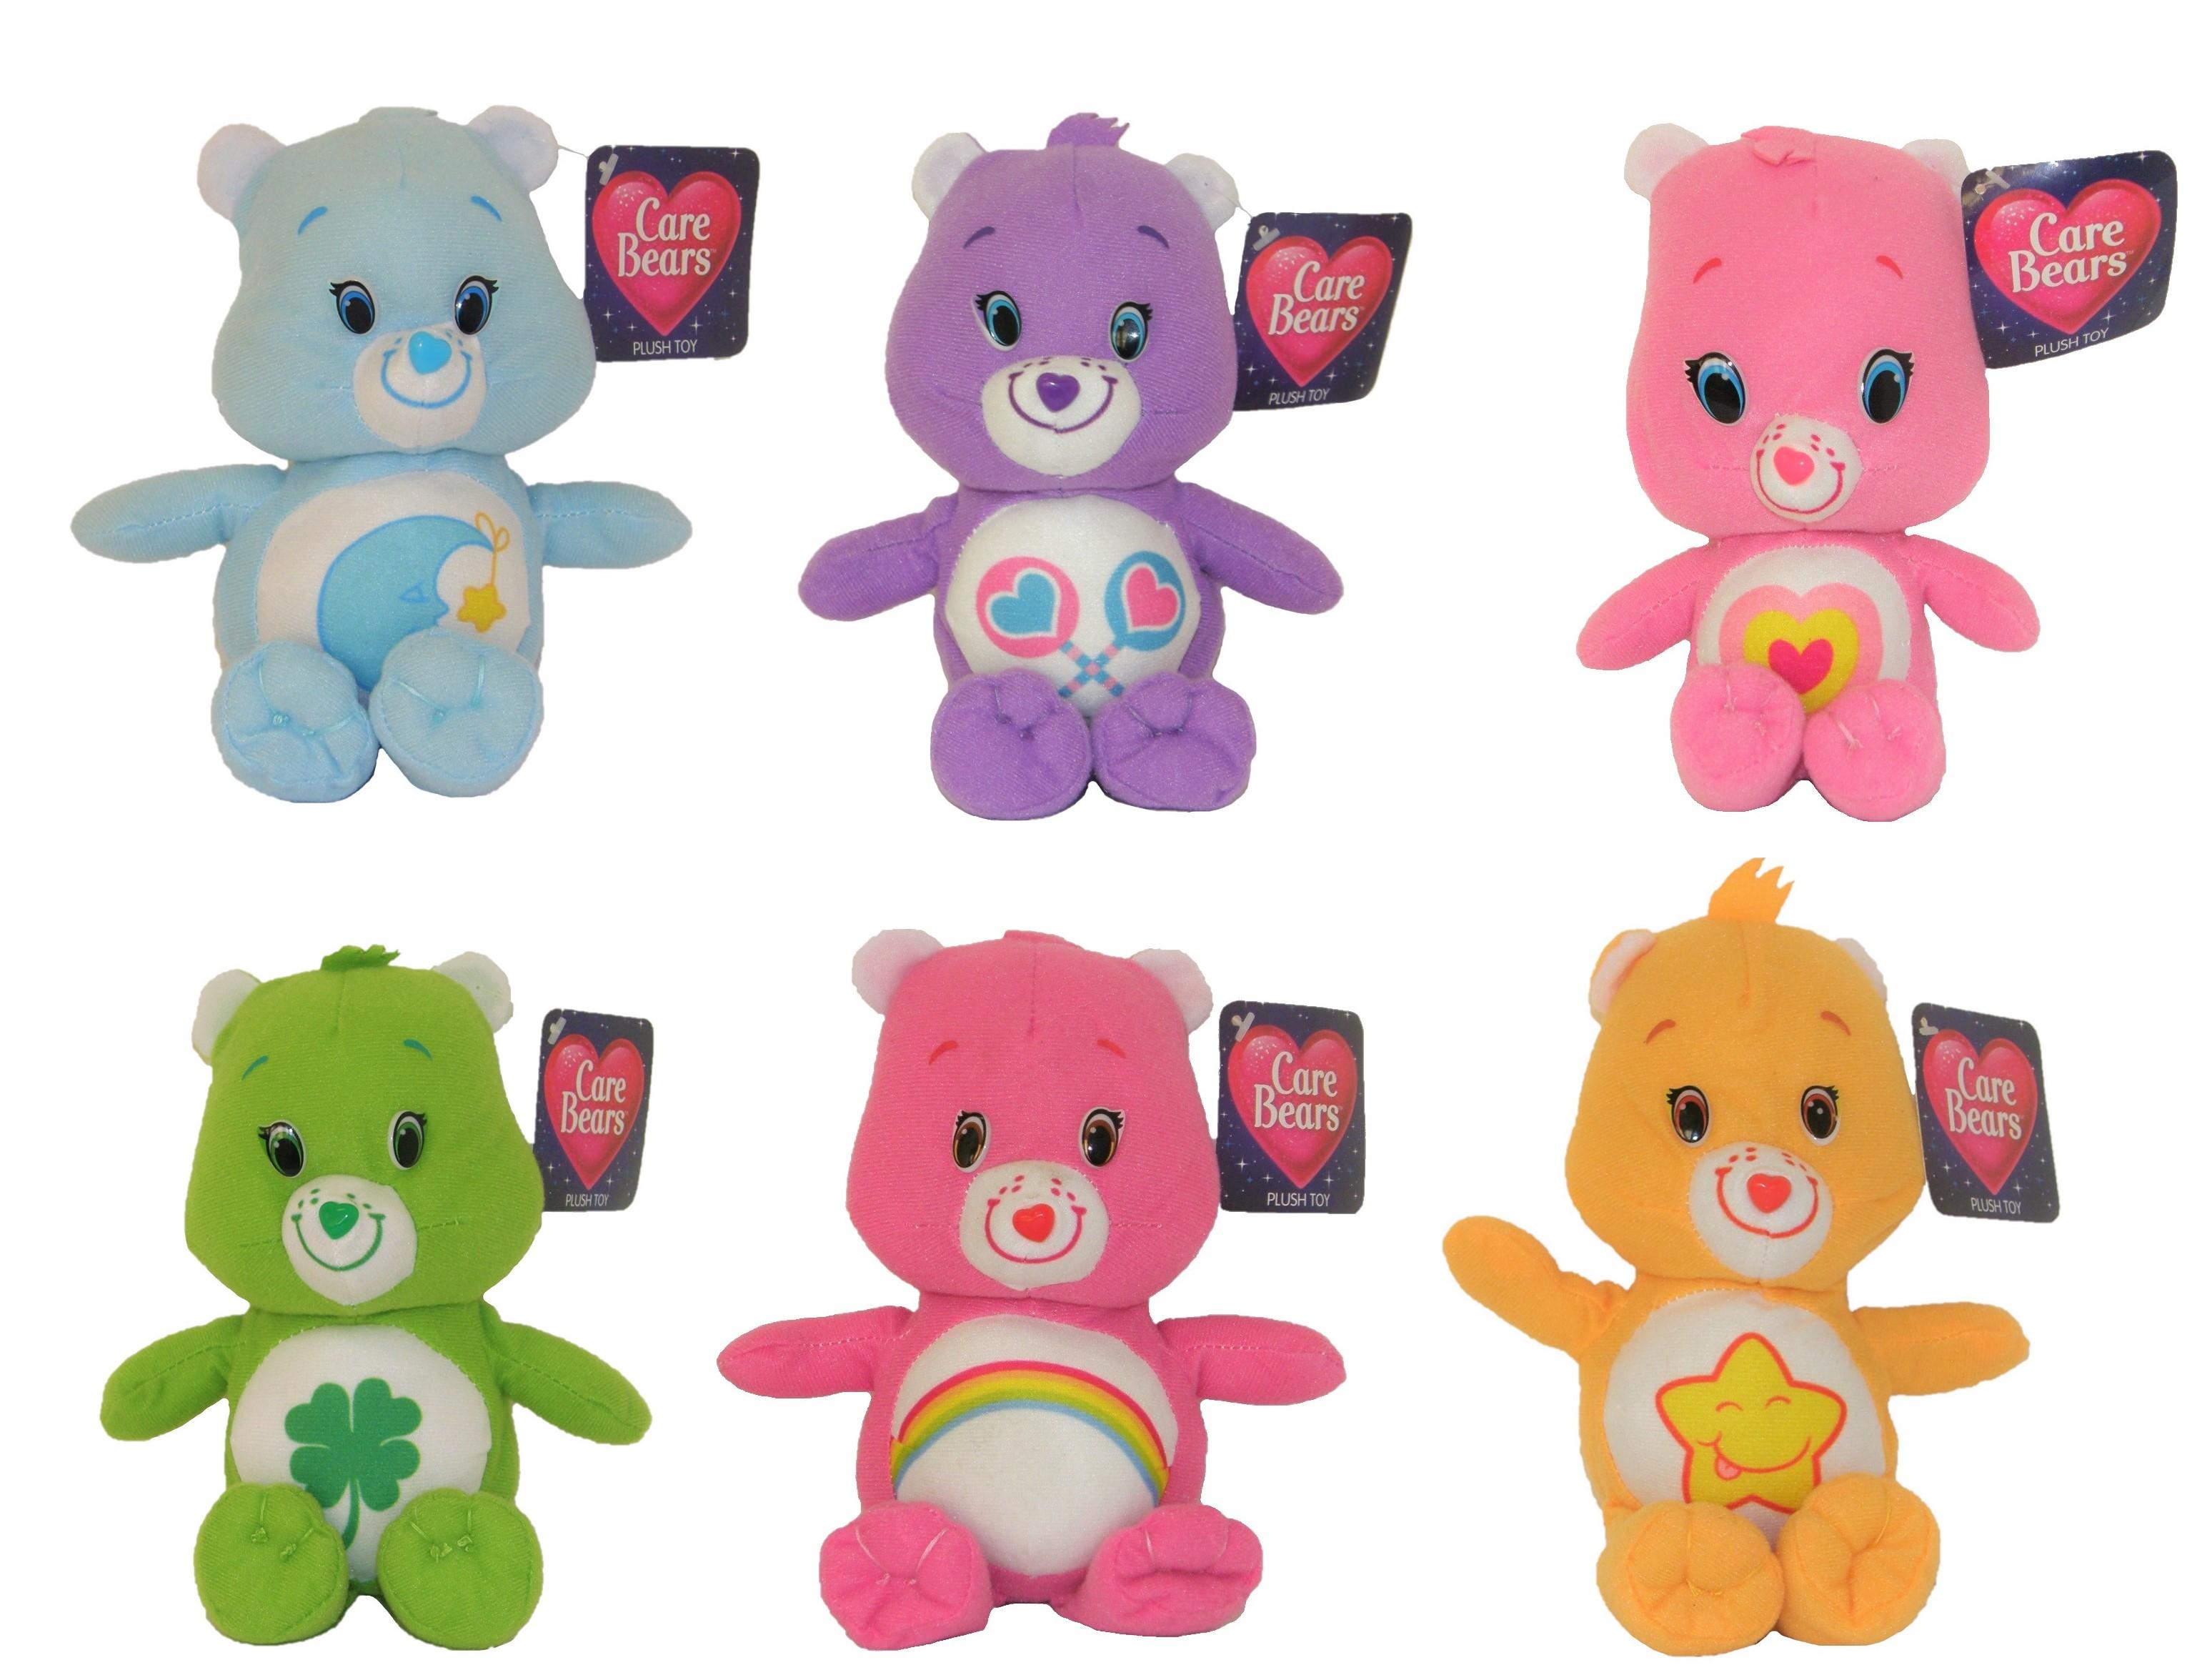 Care Bears Glücksbärchis Plüschtiere verschiedene Charaktere 16 cm (Auswahl)